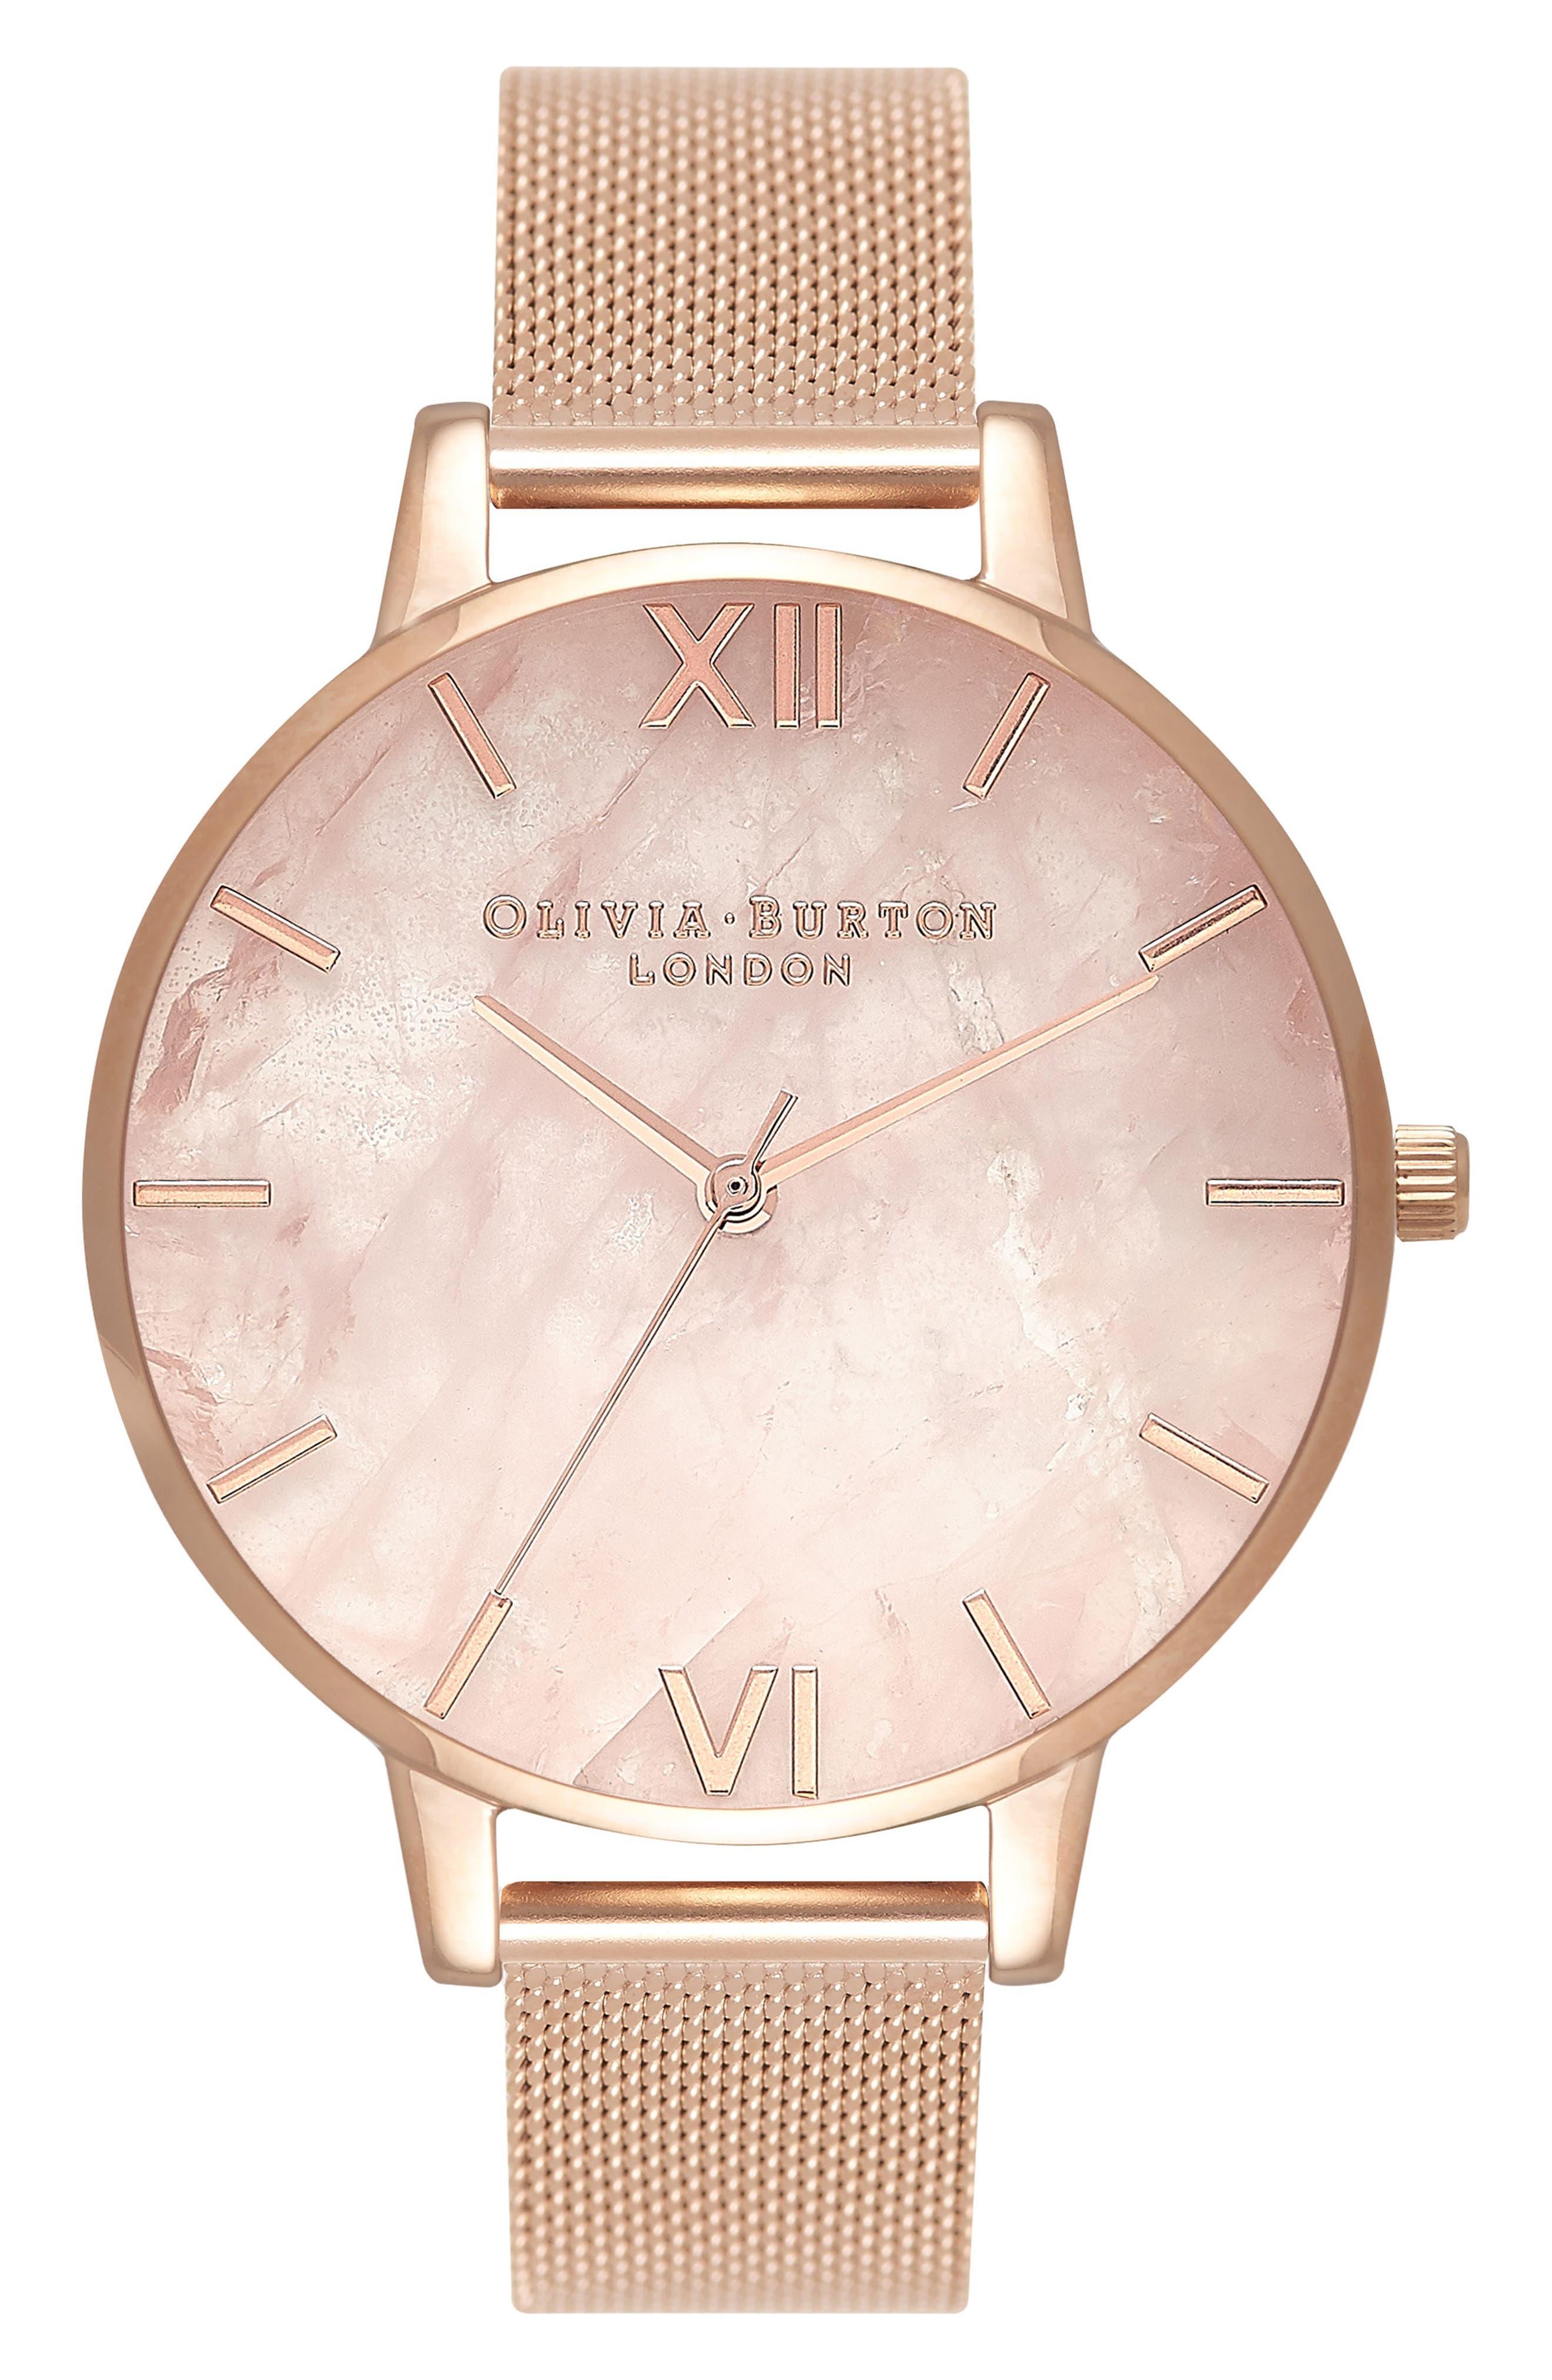 OLIVIA BURTON, Mesh Strap Watch, 38mm, Main thumbnail 1, color, ROSE GOLD